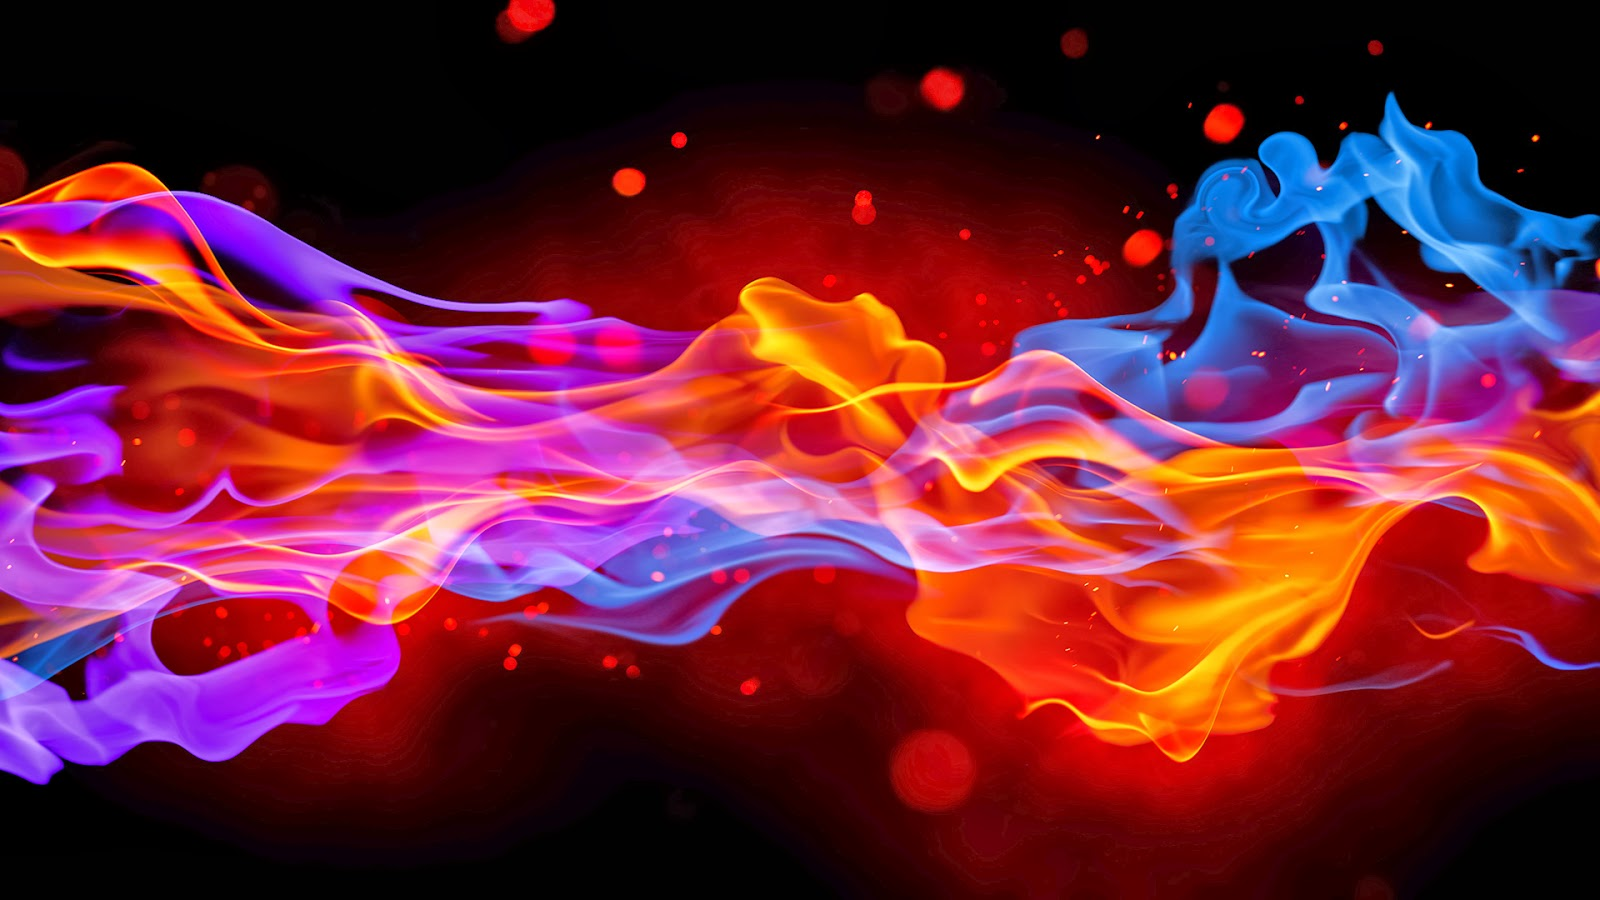 Blue Fire Background WallpaperSafari